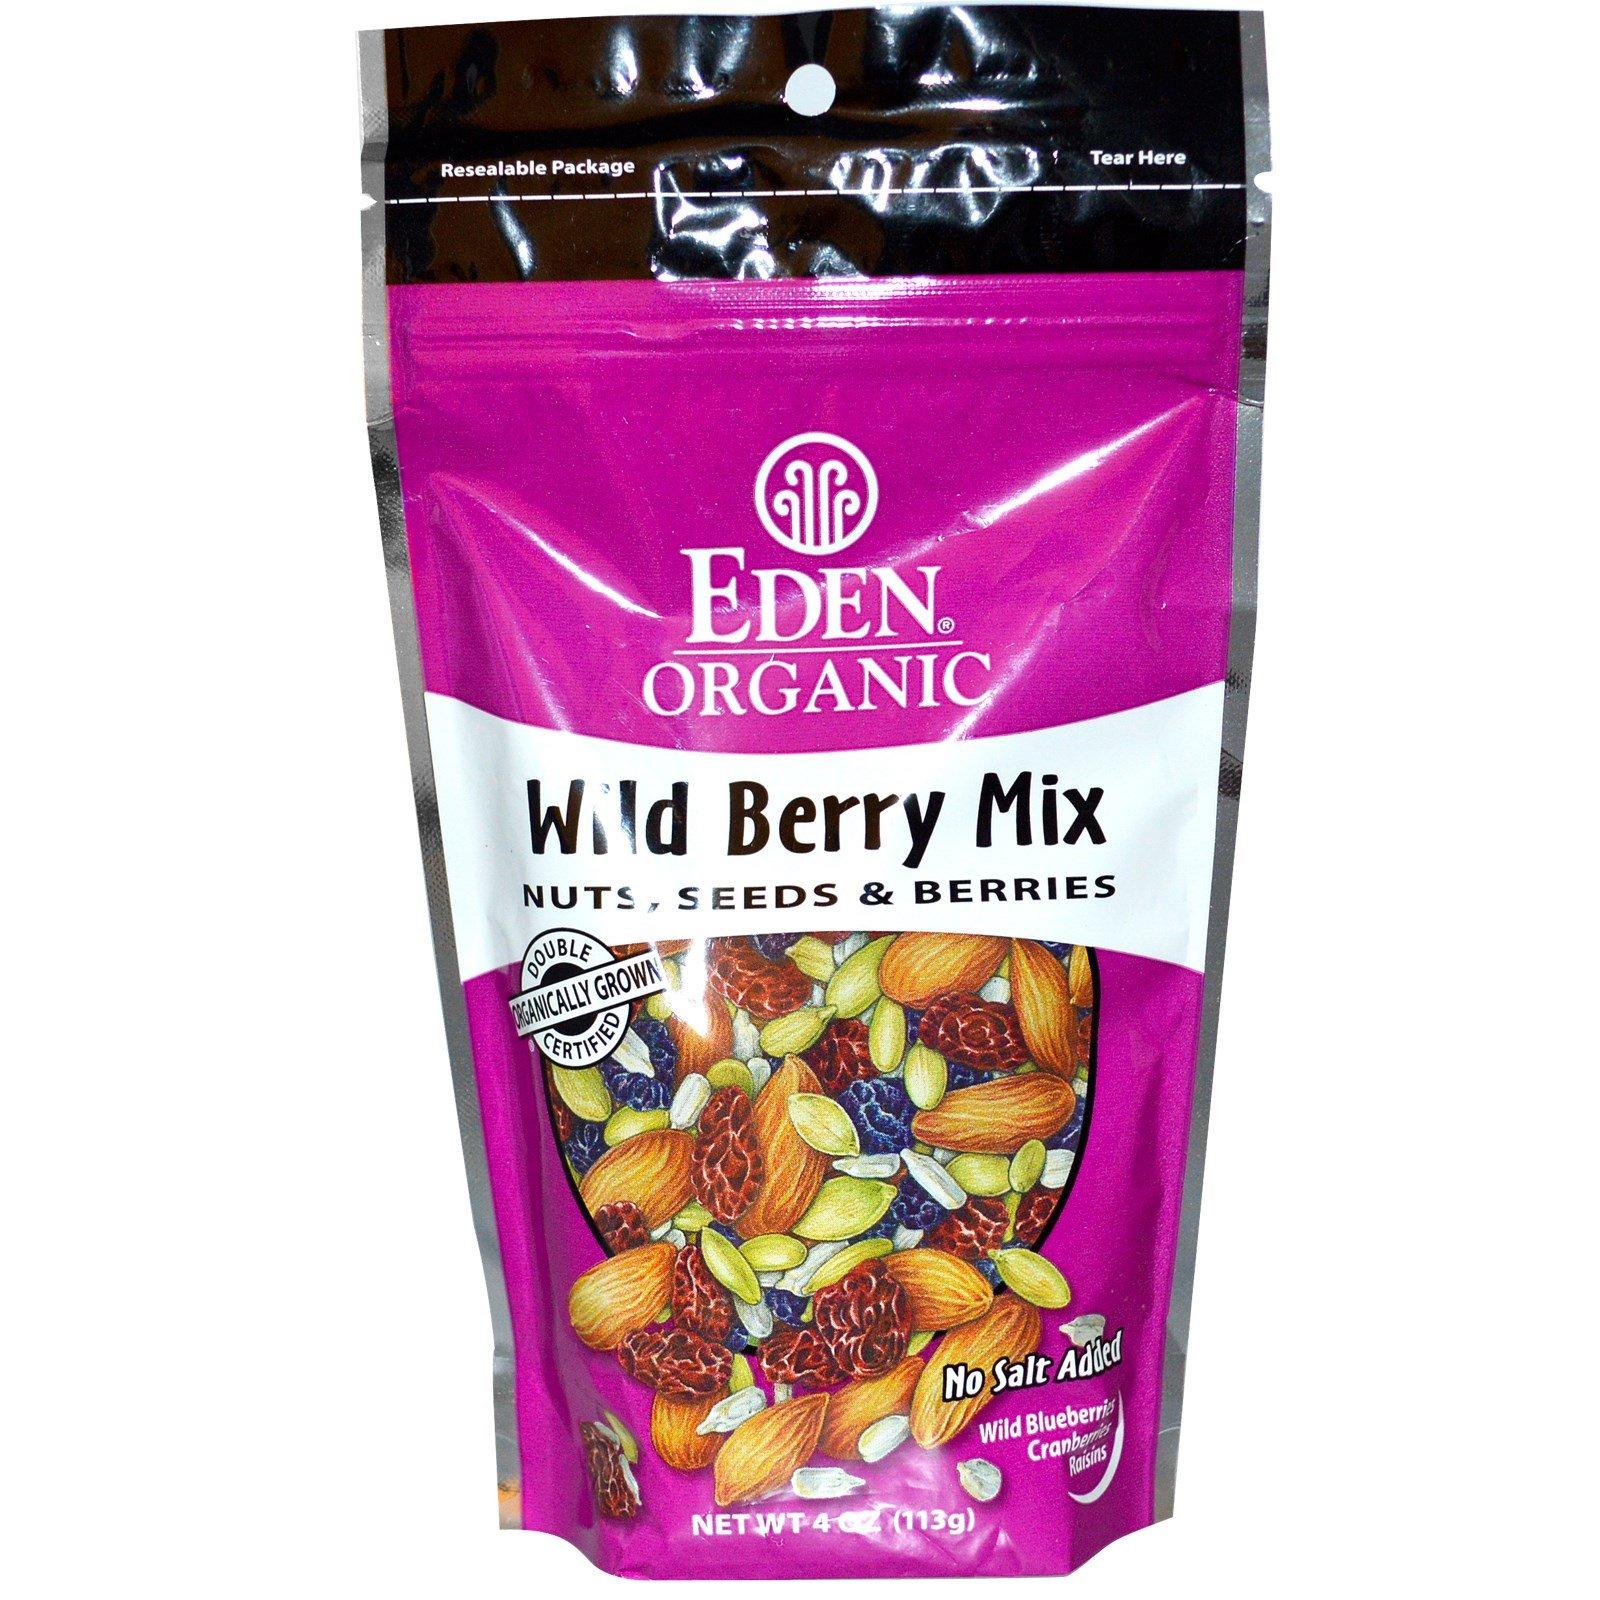 Eden Foods, Organic, Wild Berry Mix, Nuts, Seeds & Berries, 4 oz (113 g) - 2pcs